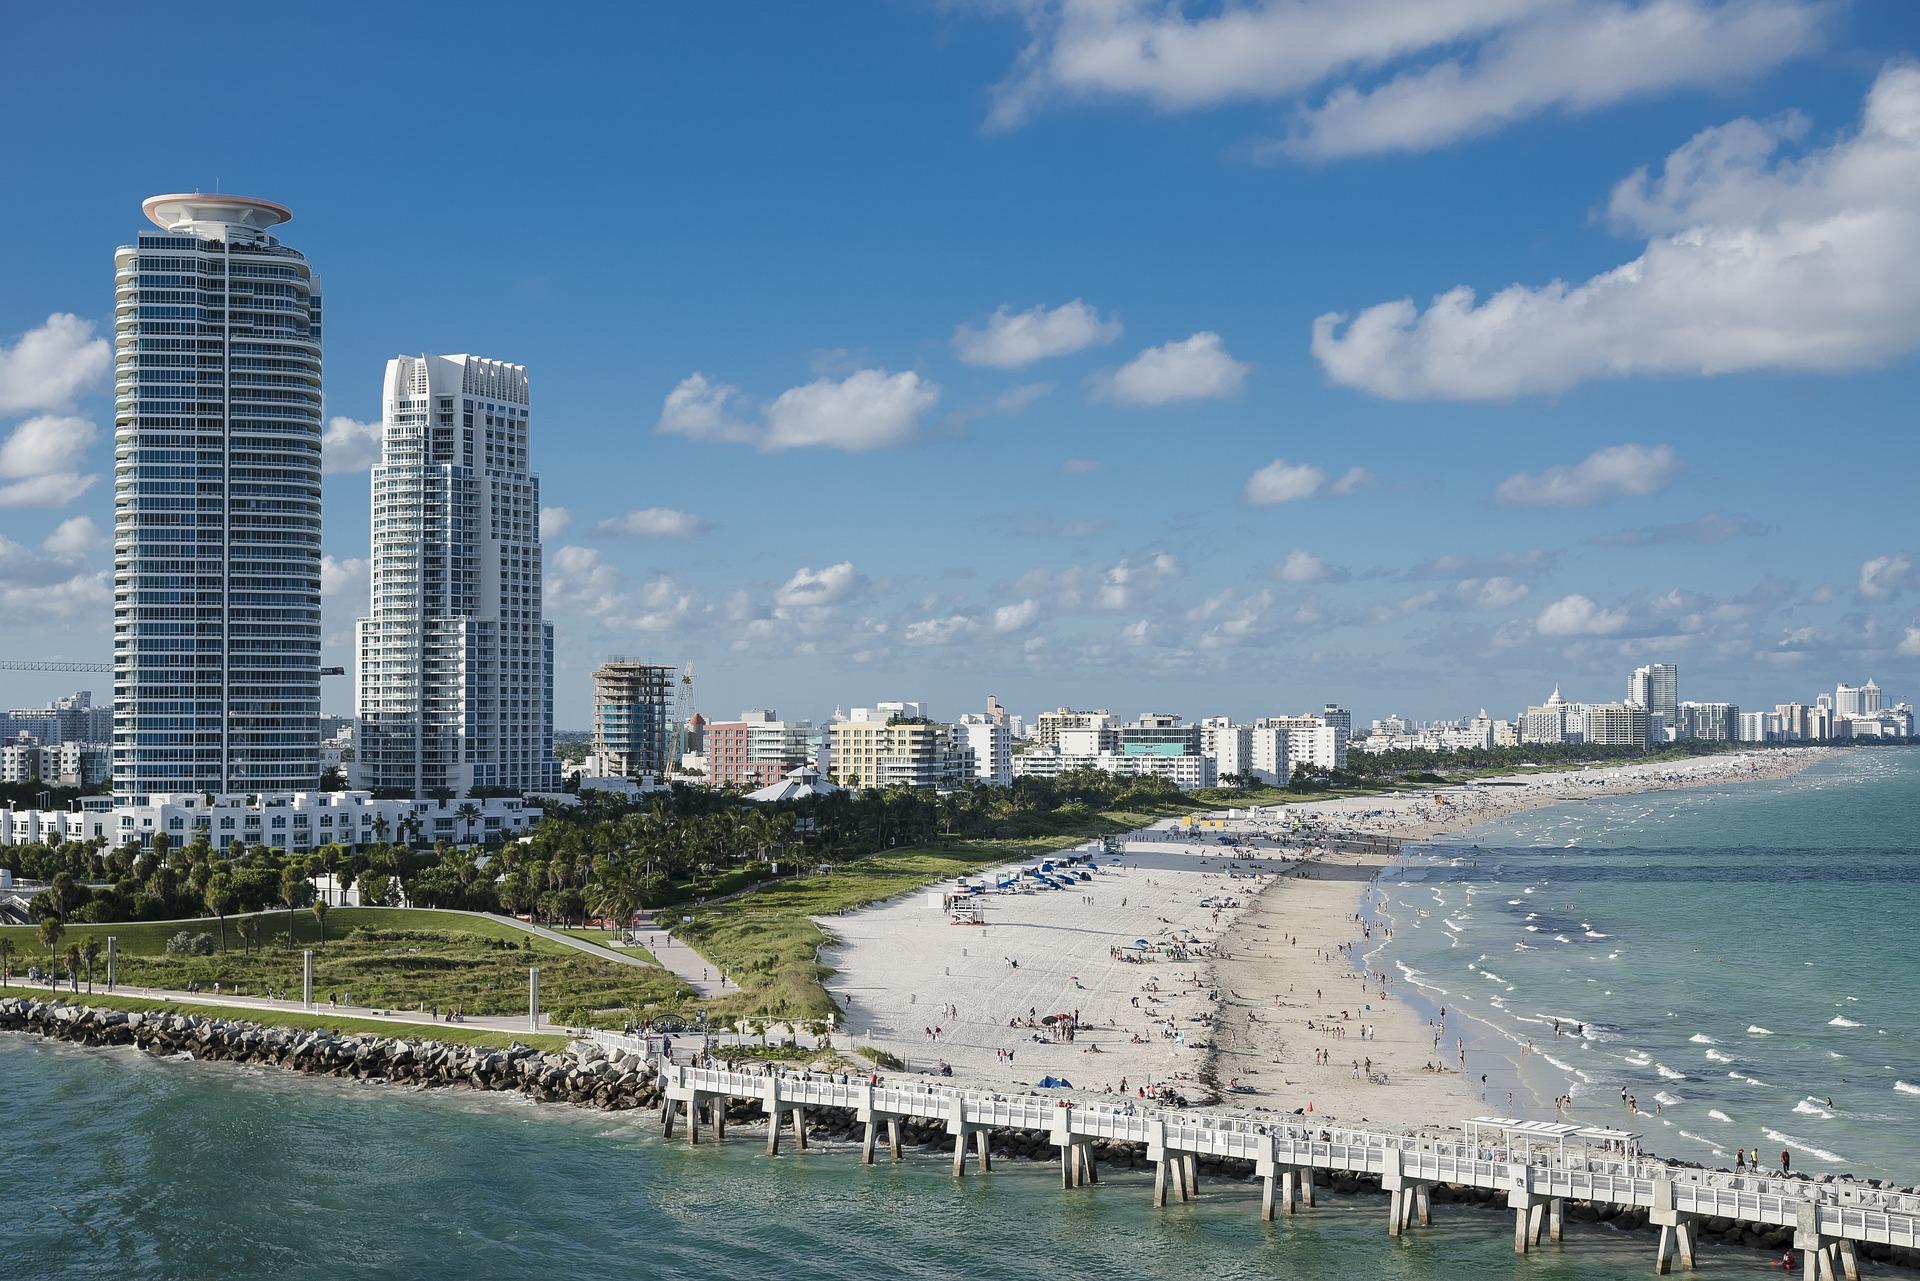 Best things in Miami